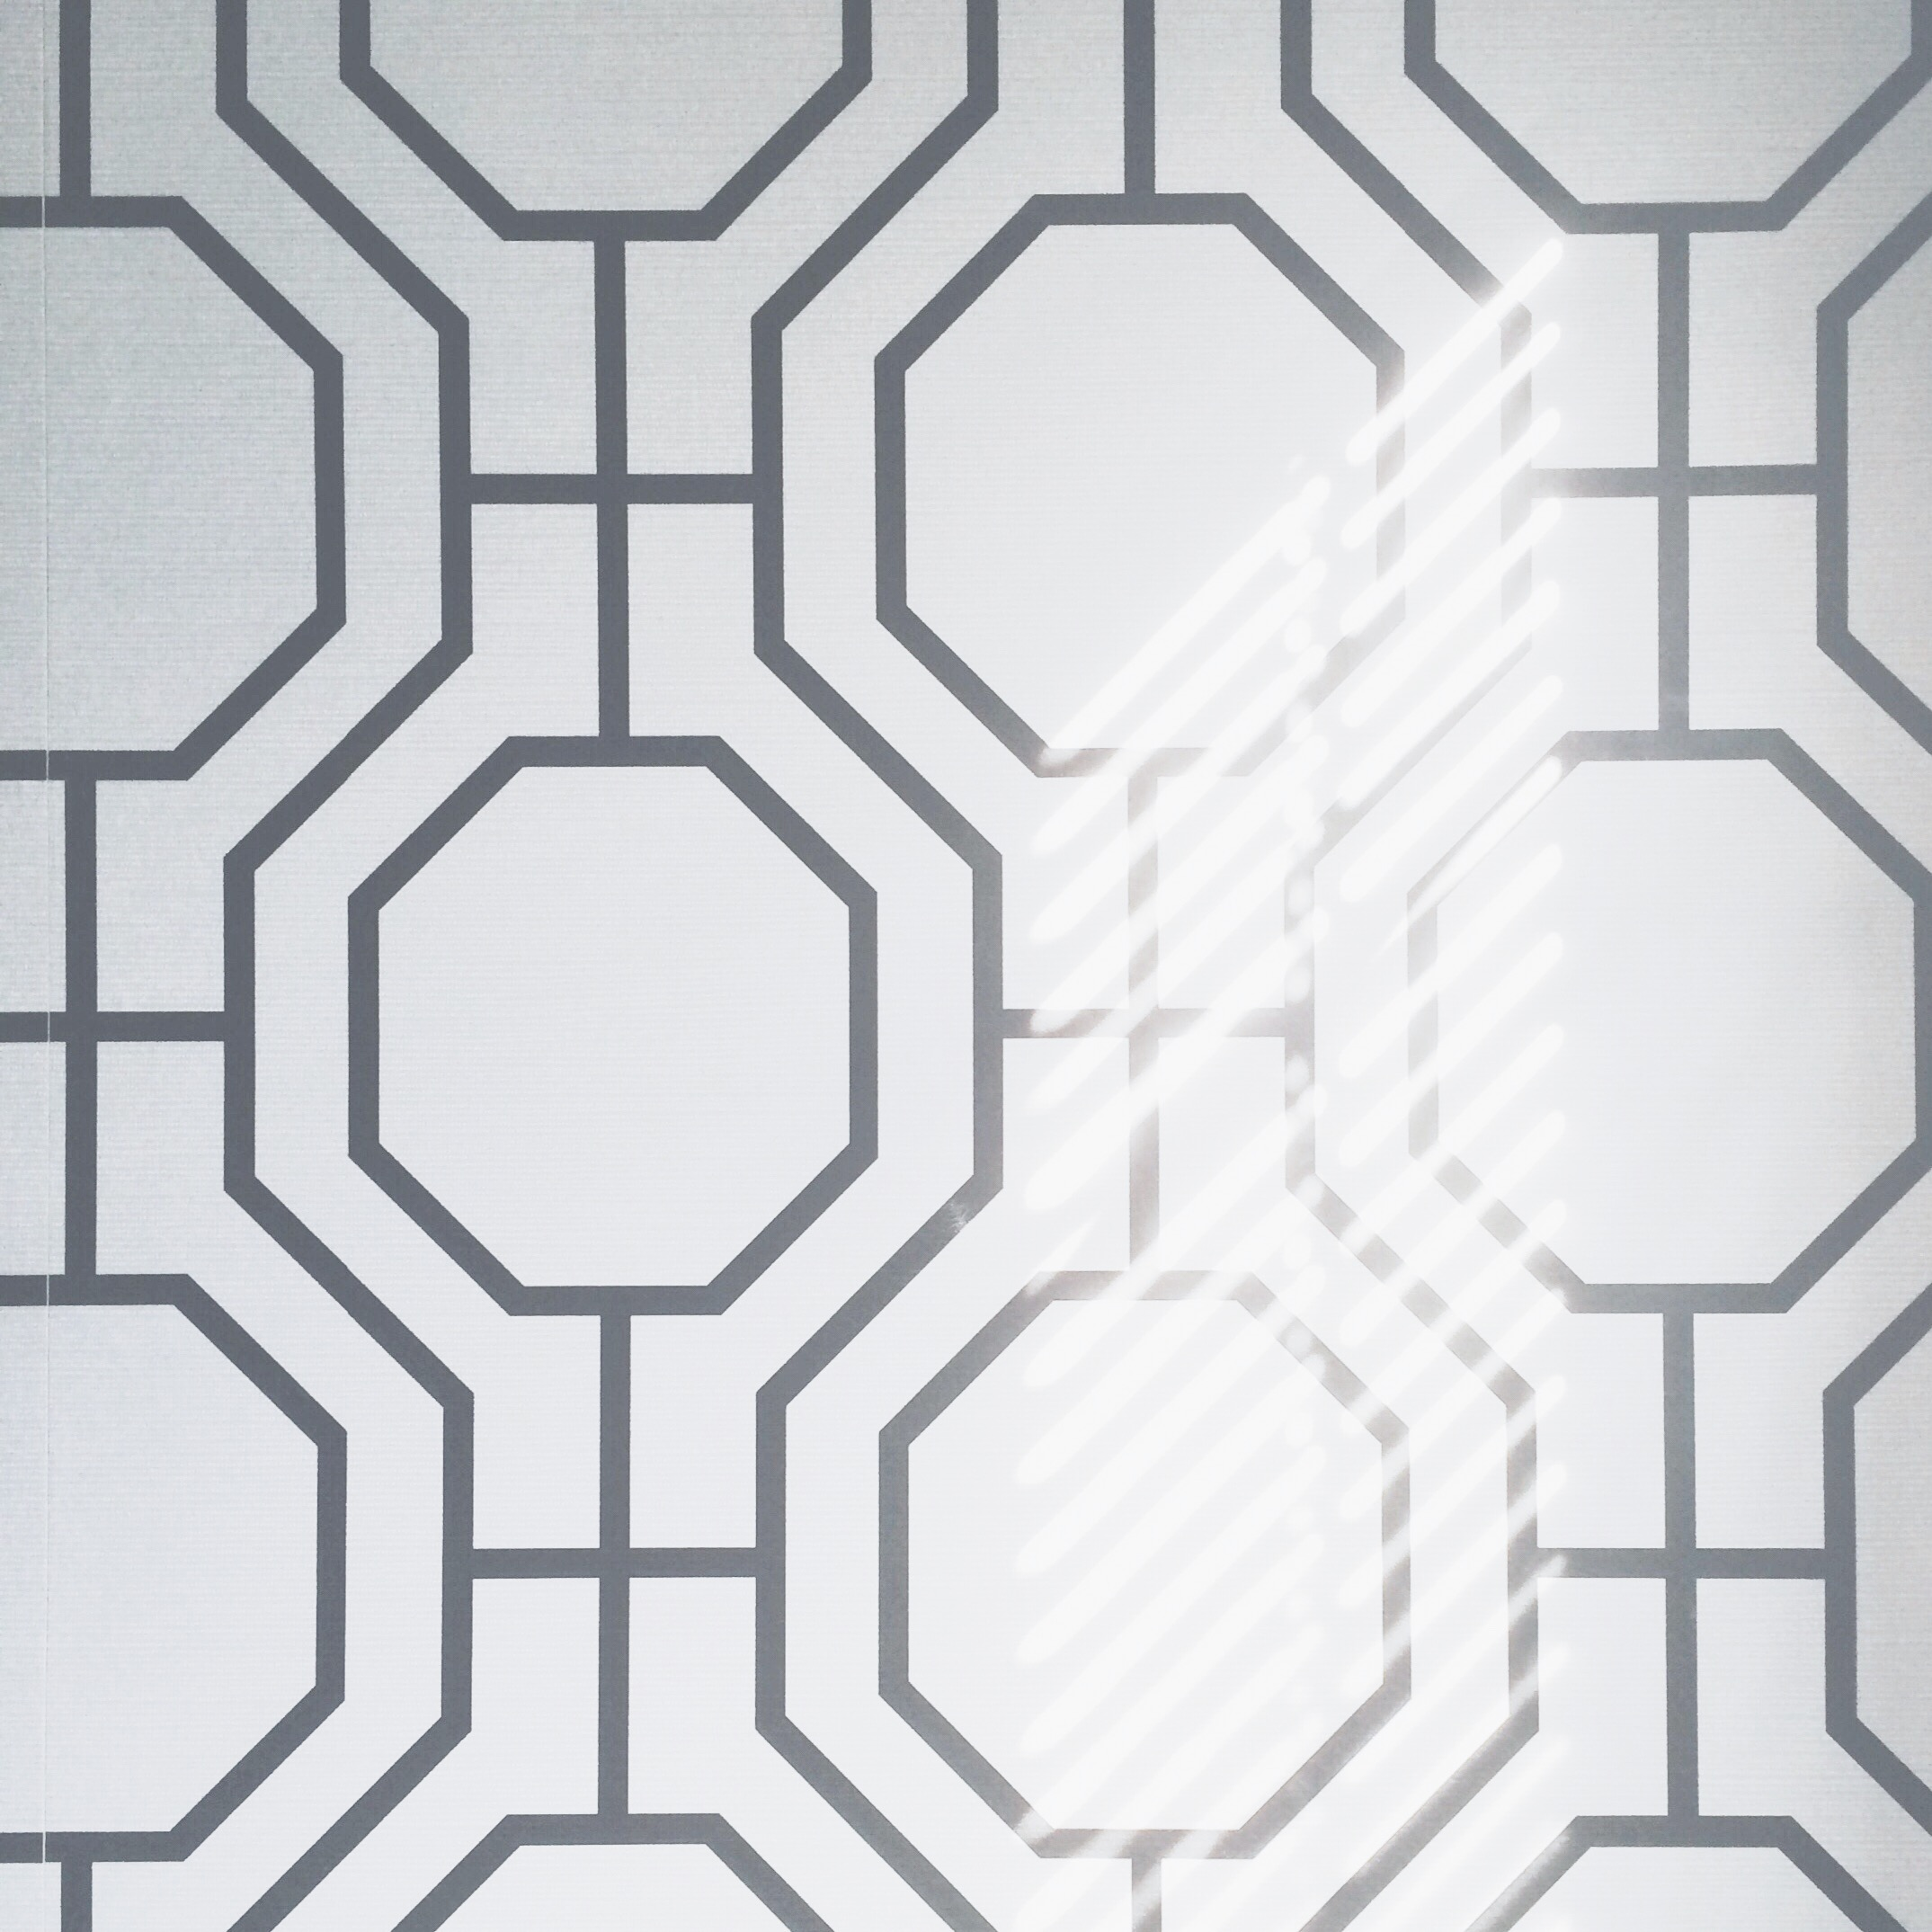 Stef_Etow_patterns_wallpaper.JPG